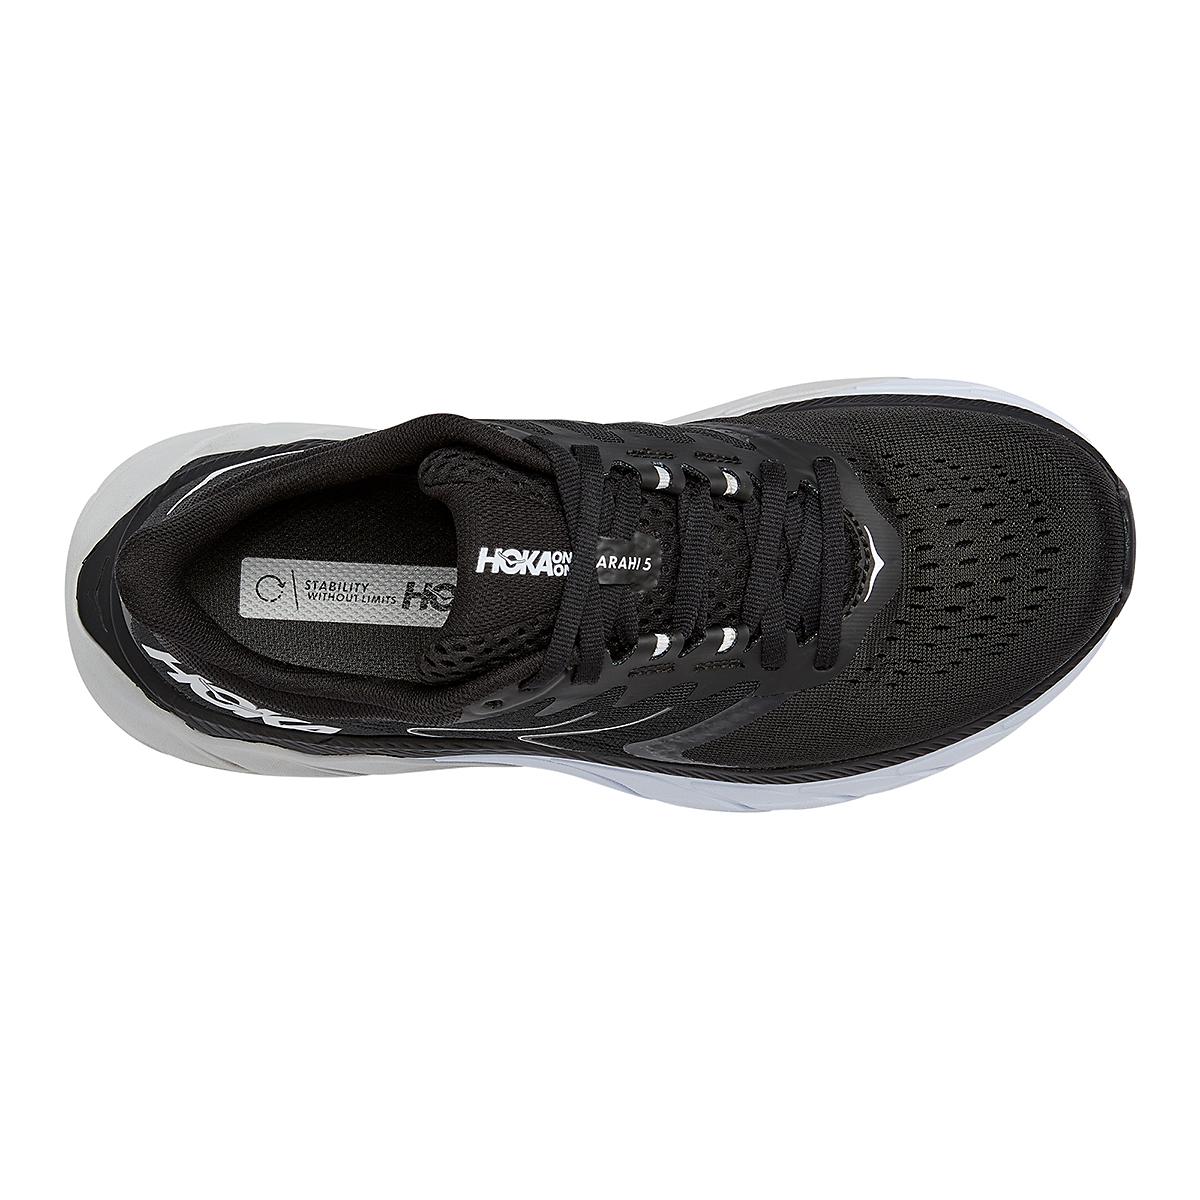 Women's Hoka One One Arahi 5 Running Shoe - Color: Black/White - Size: 5 - Width: Regular, Black/White, large, image 5